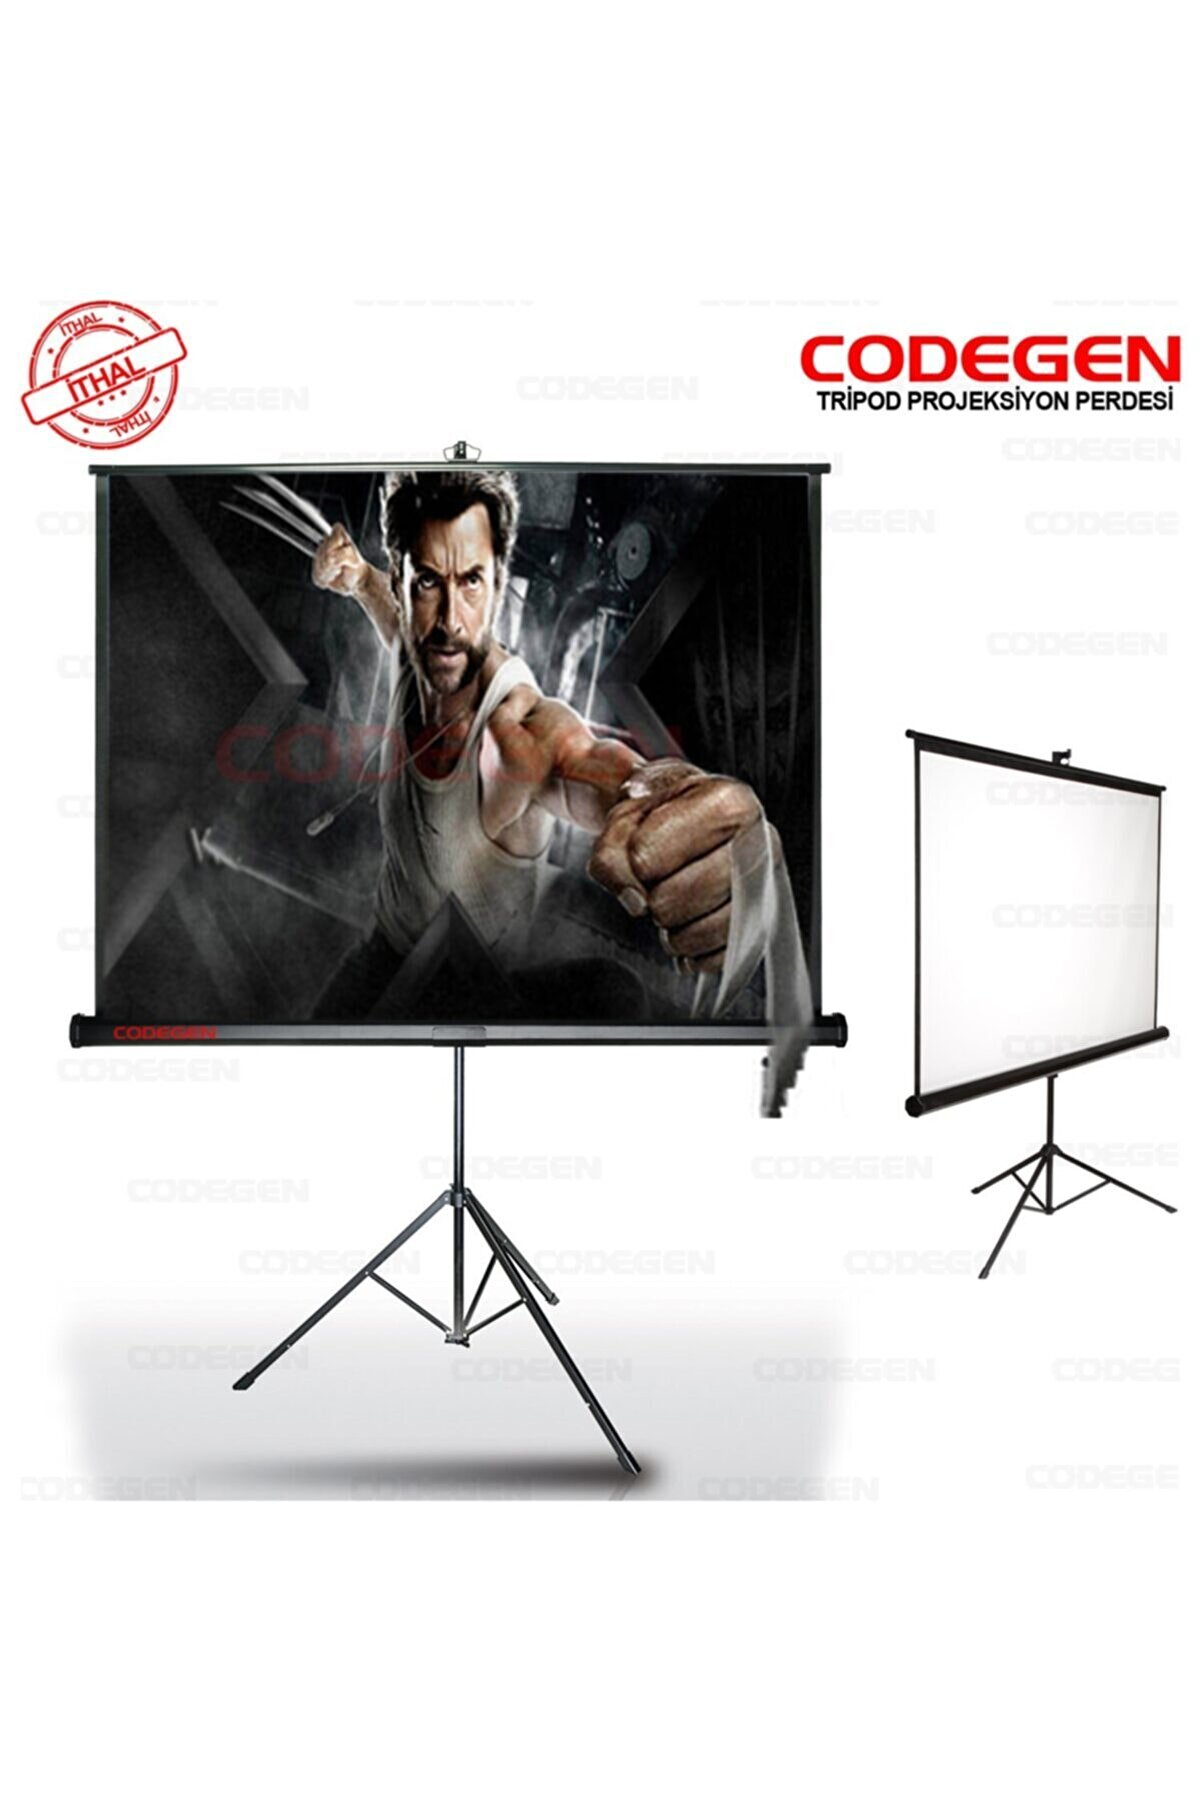 CODEGEN (Tx-20)200x200 Tripod Projeksiyon Perdesi